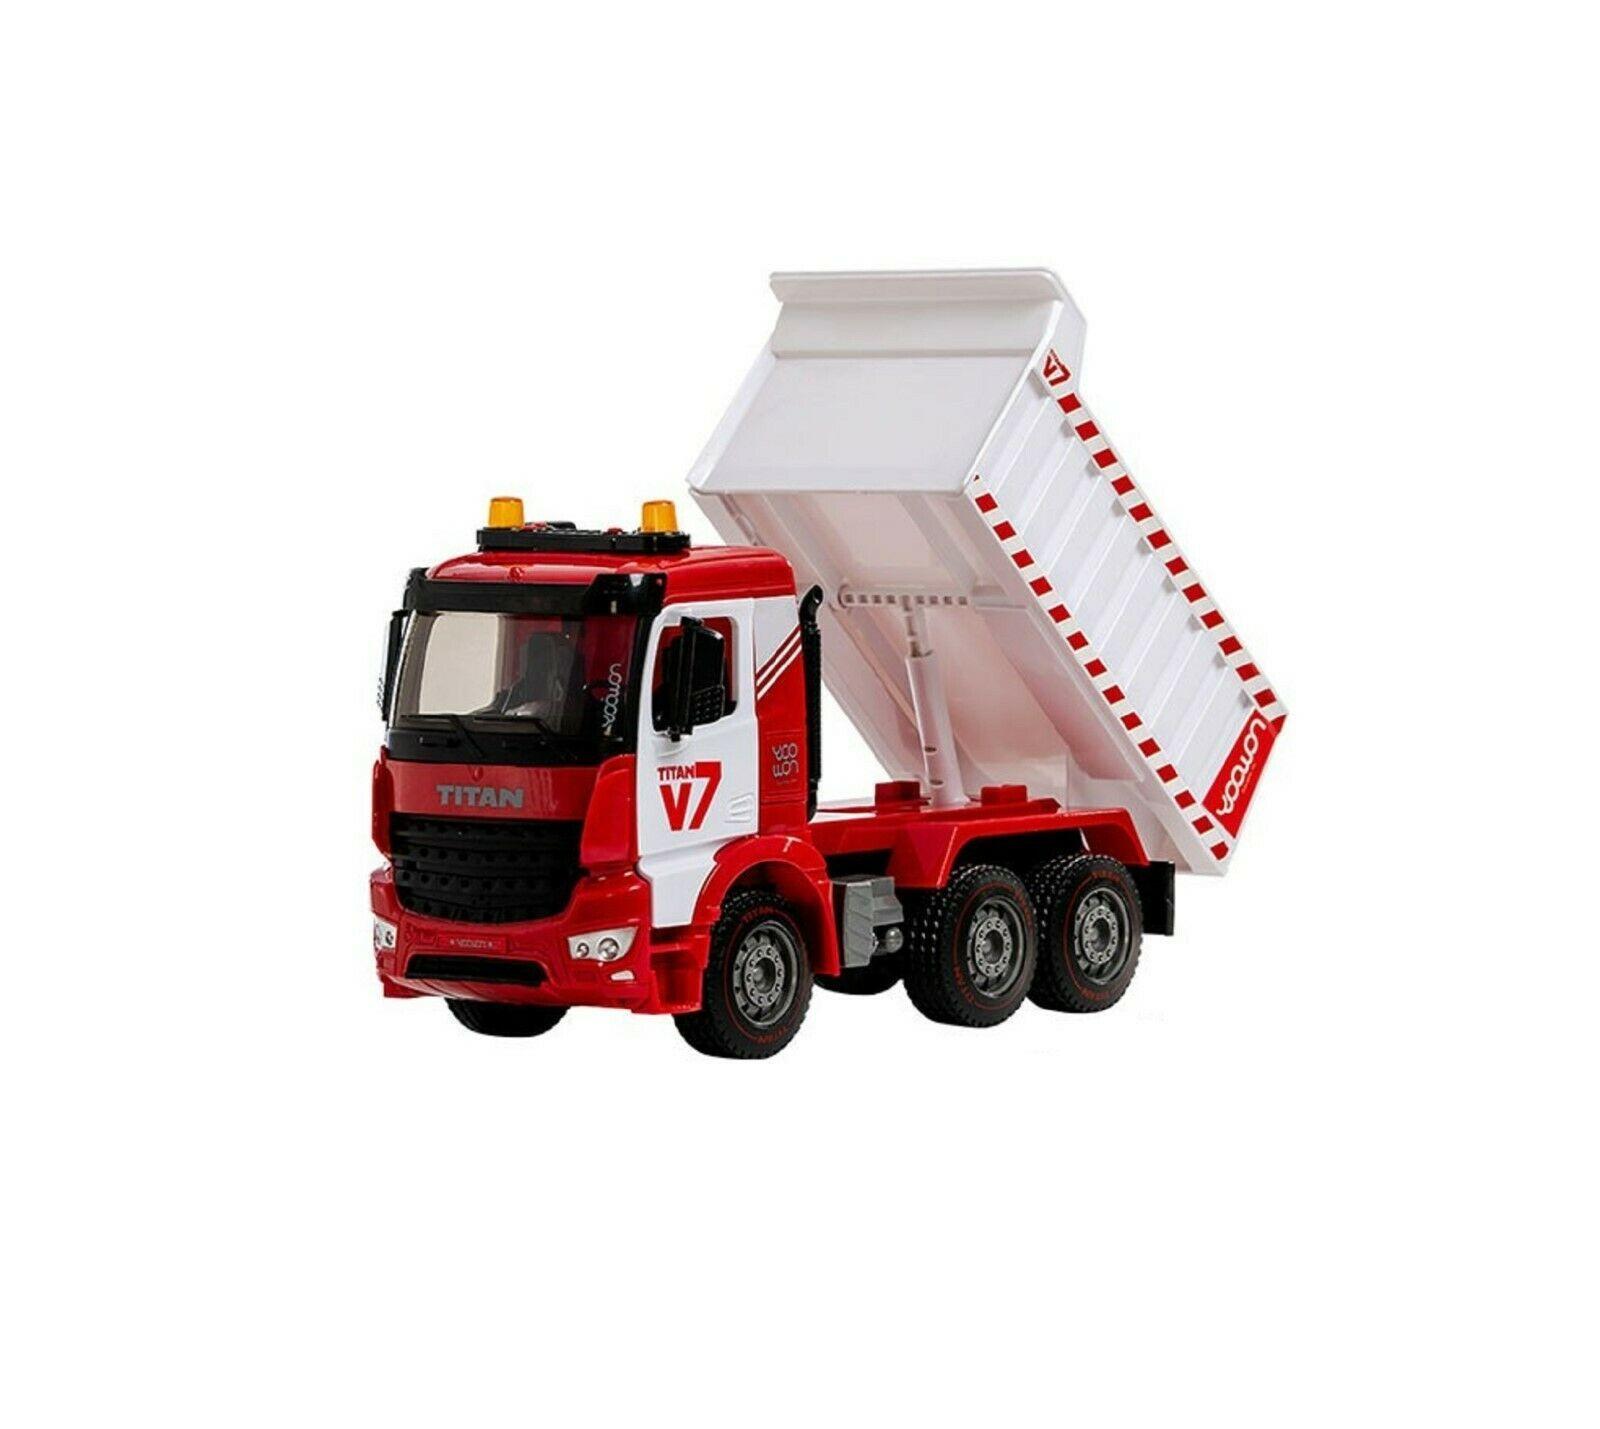 Yoowon Toys Titan V7 Dump Truck Car Vehicle Construction Heavy Equipment Toy